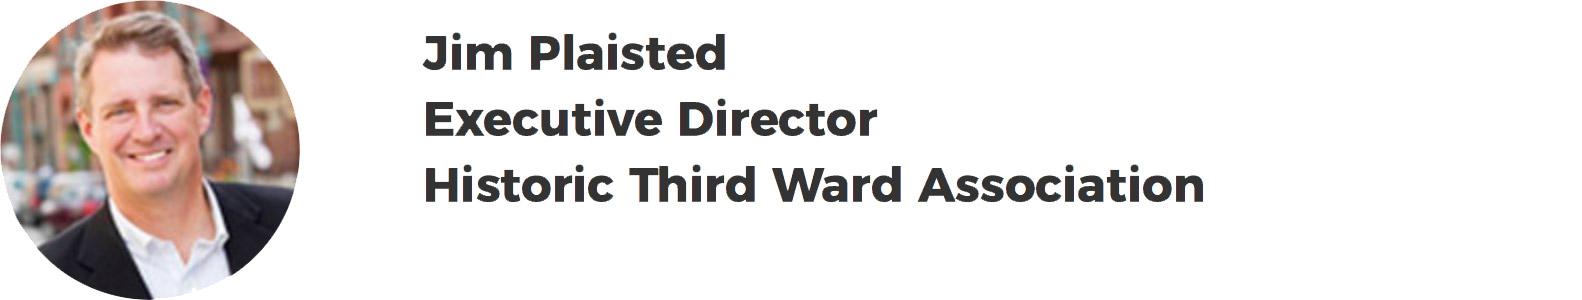 Jim Plaisted – Executive Director – Historic Third Ward Association